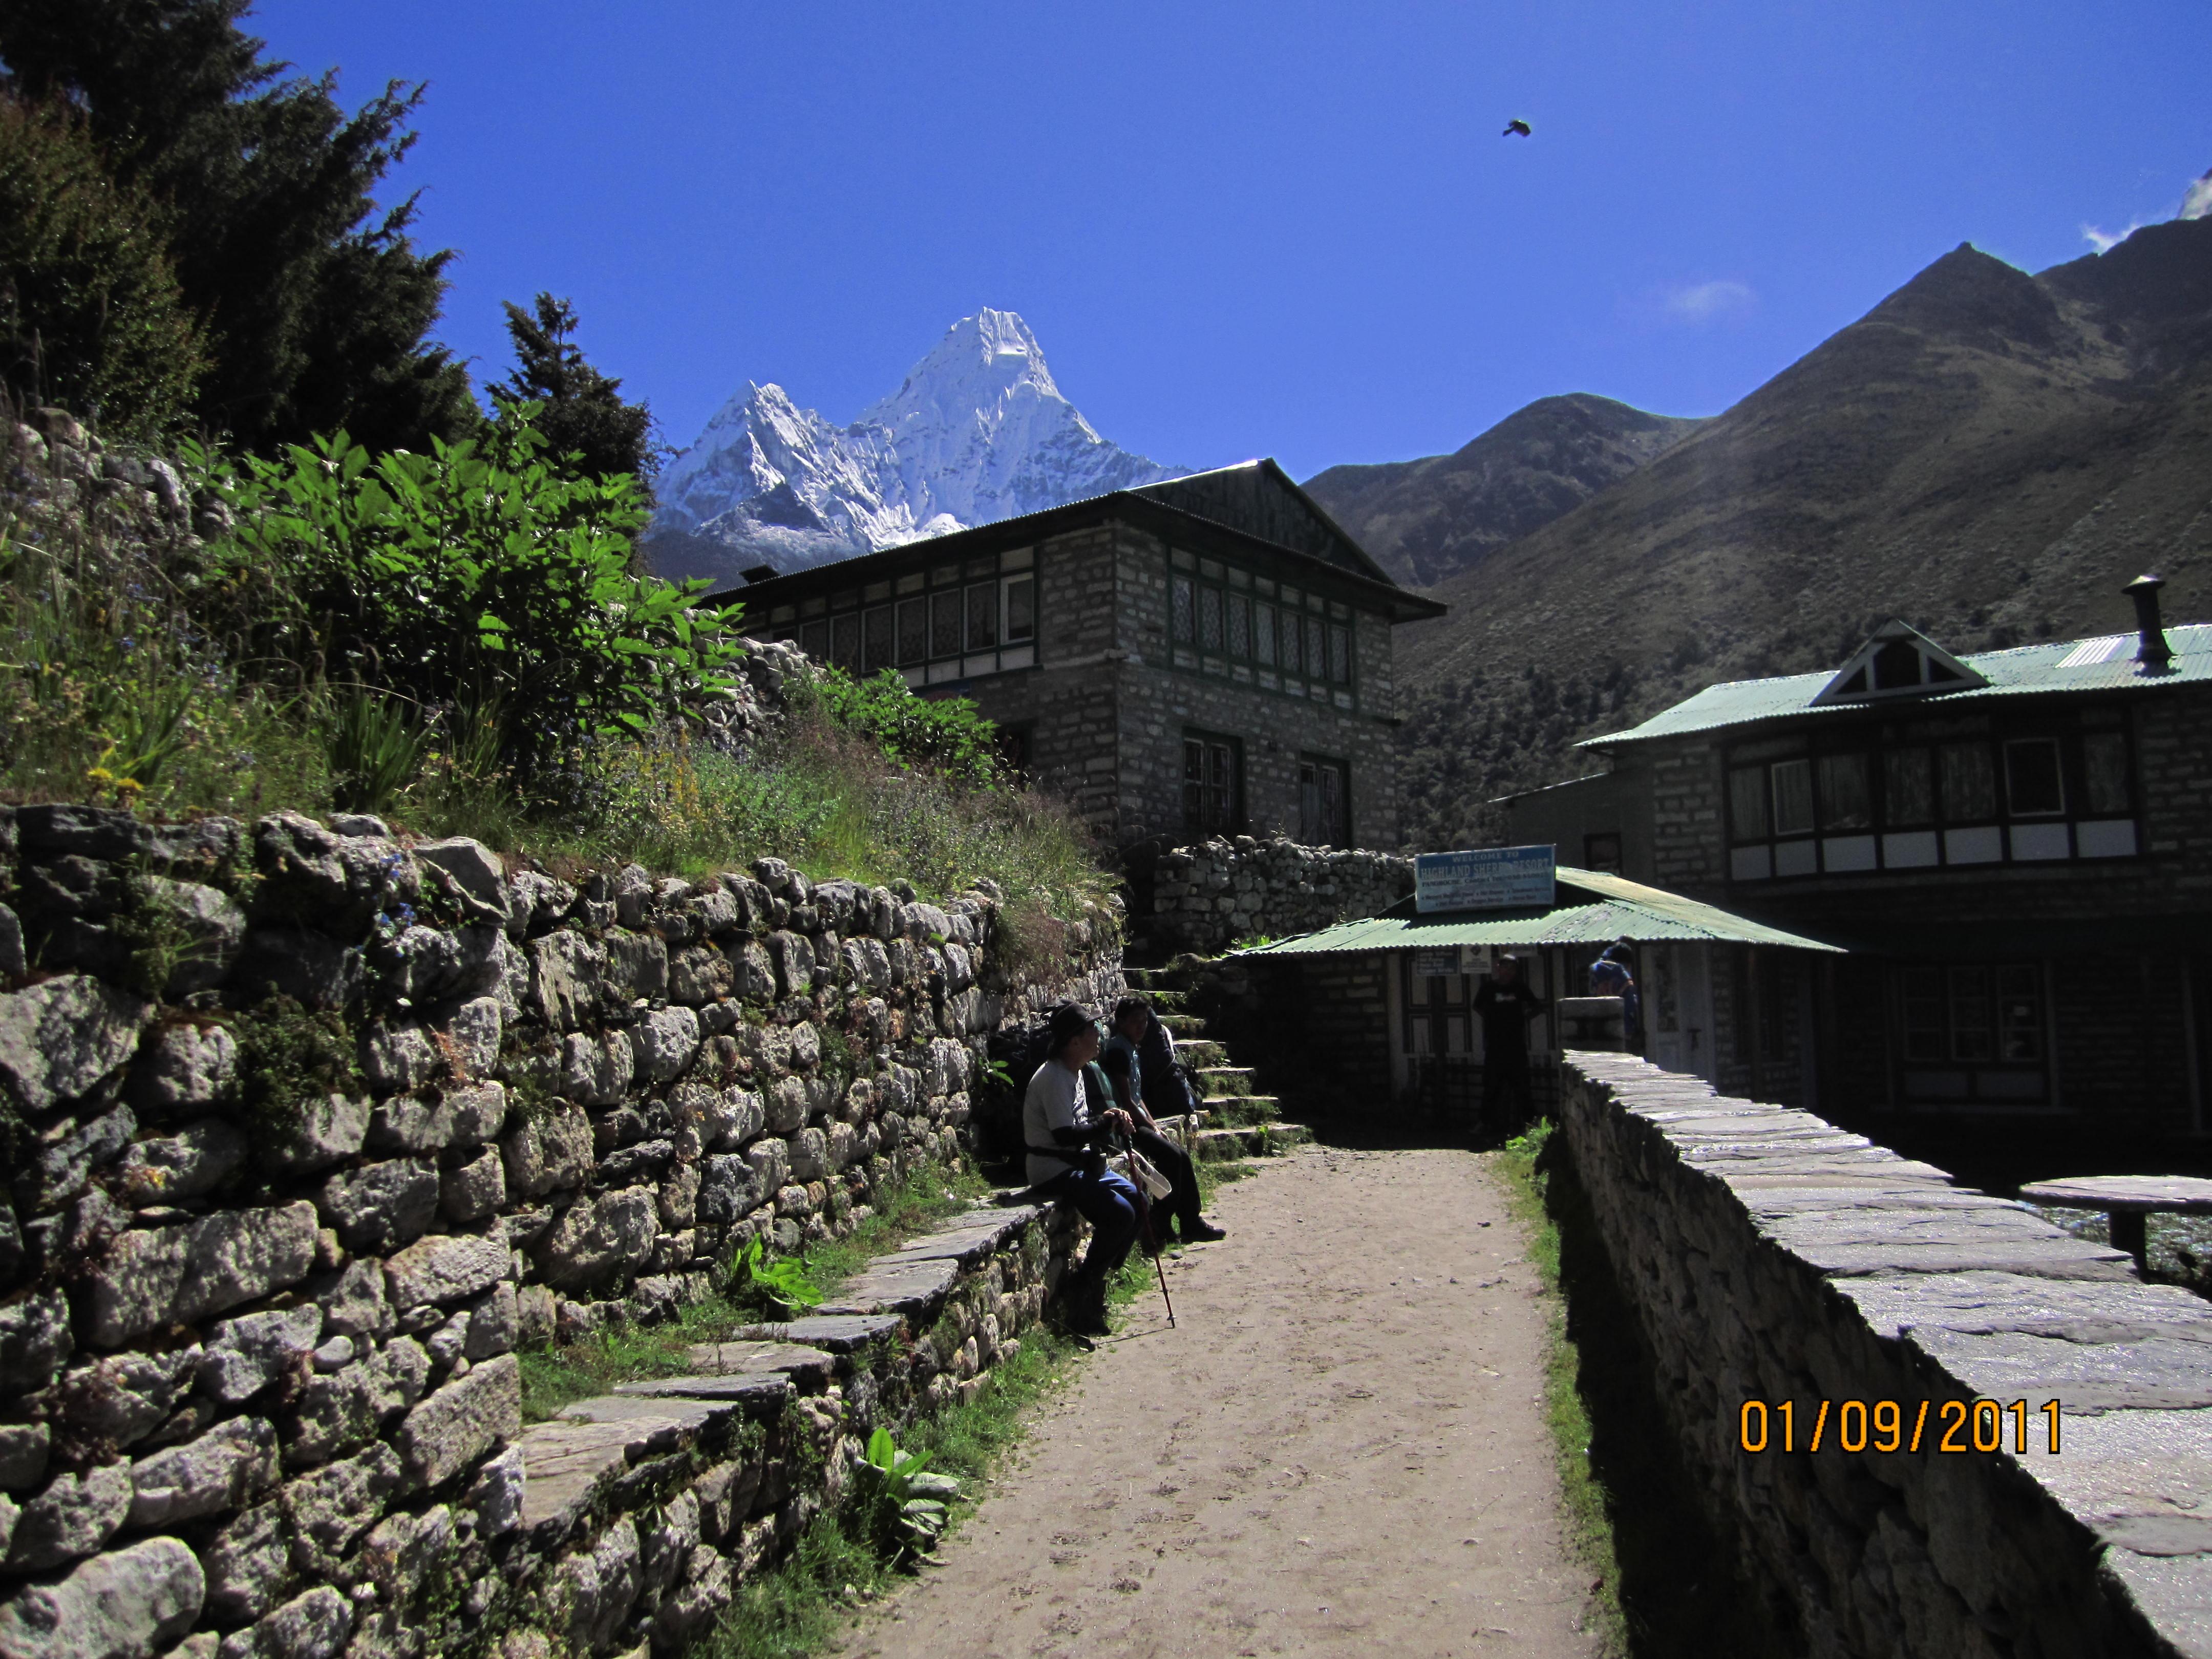 Khumbu valley trekking -  Pangboche village